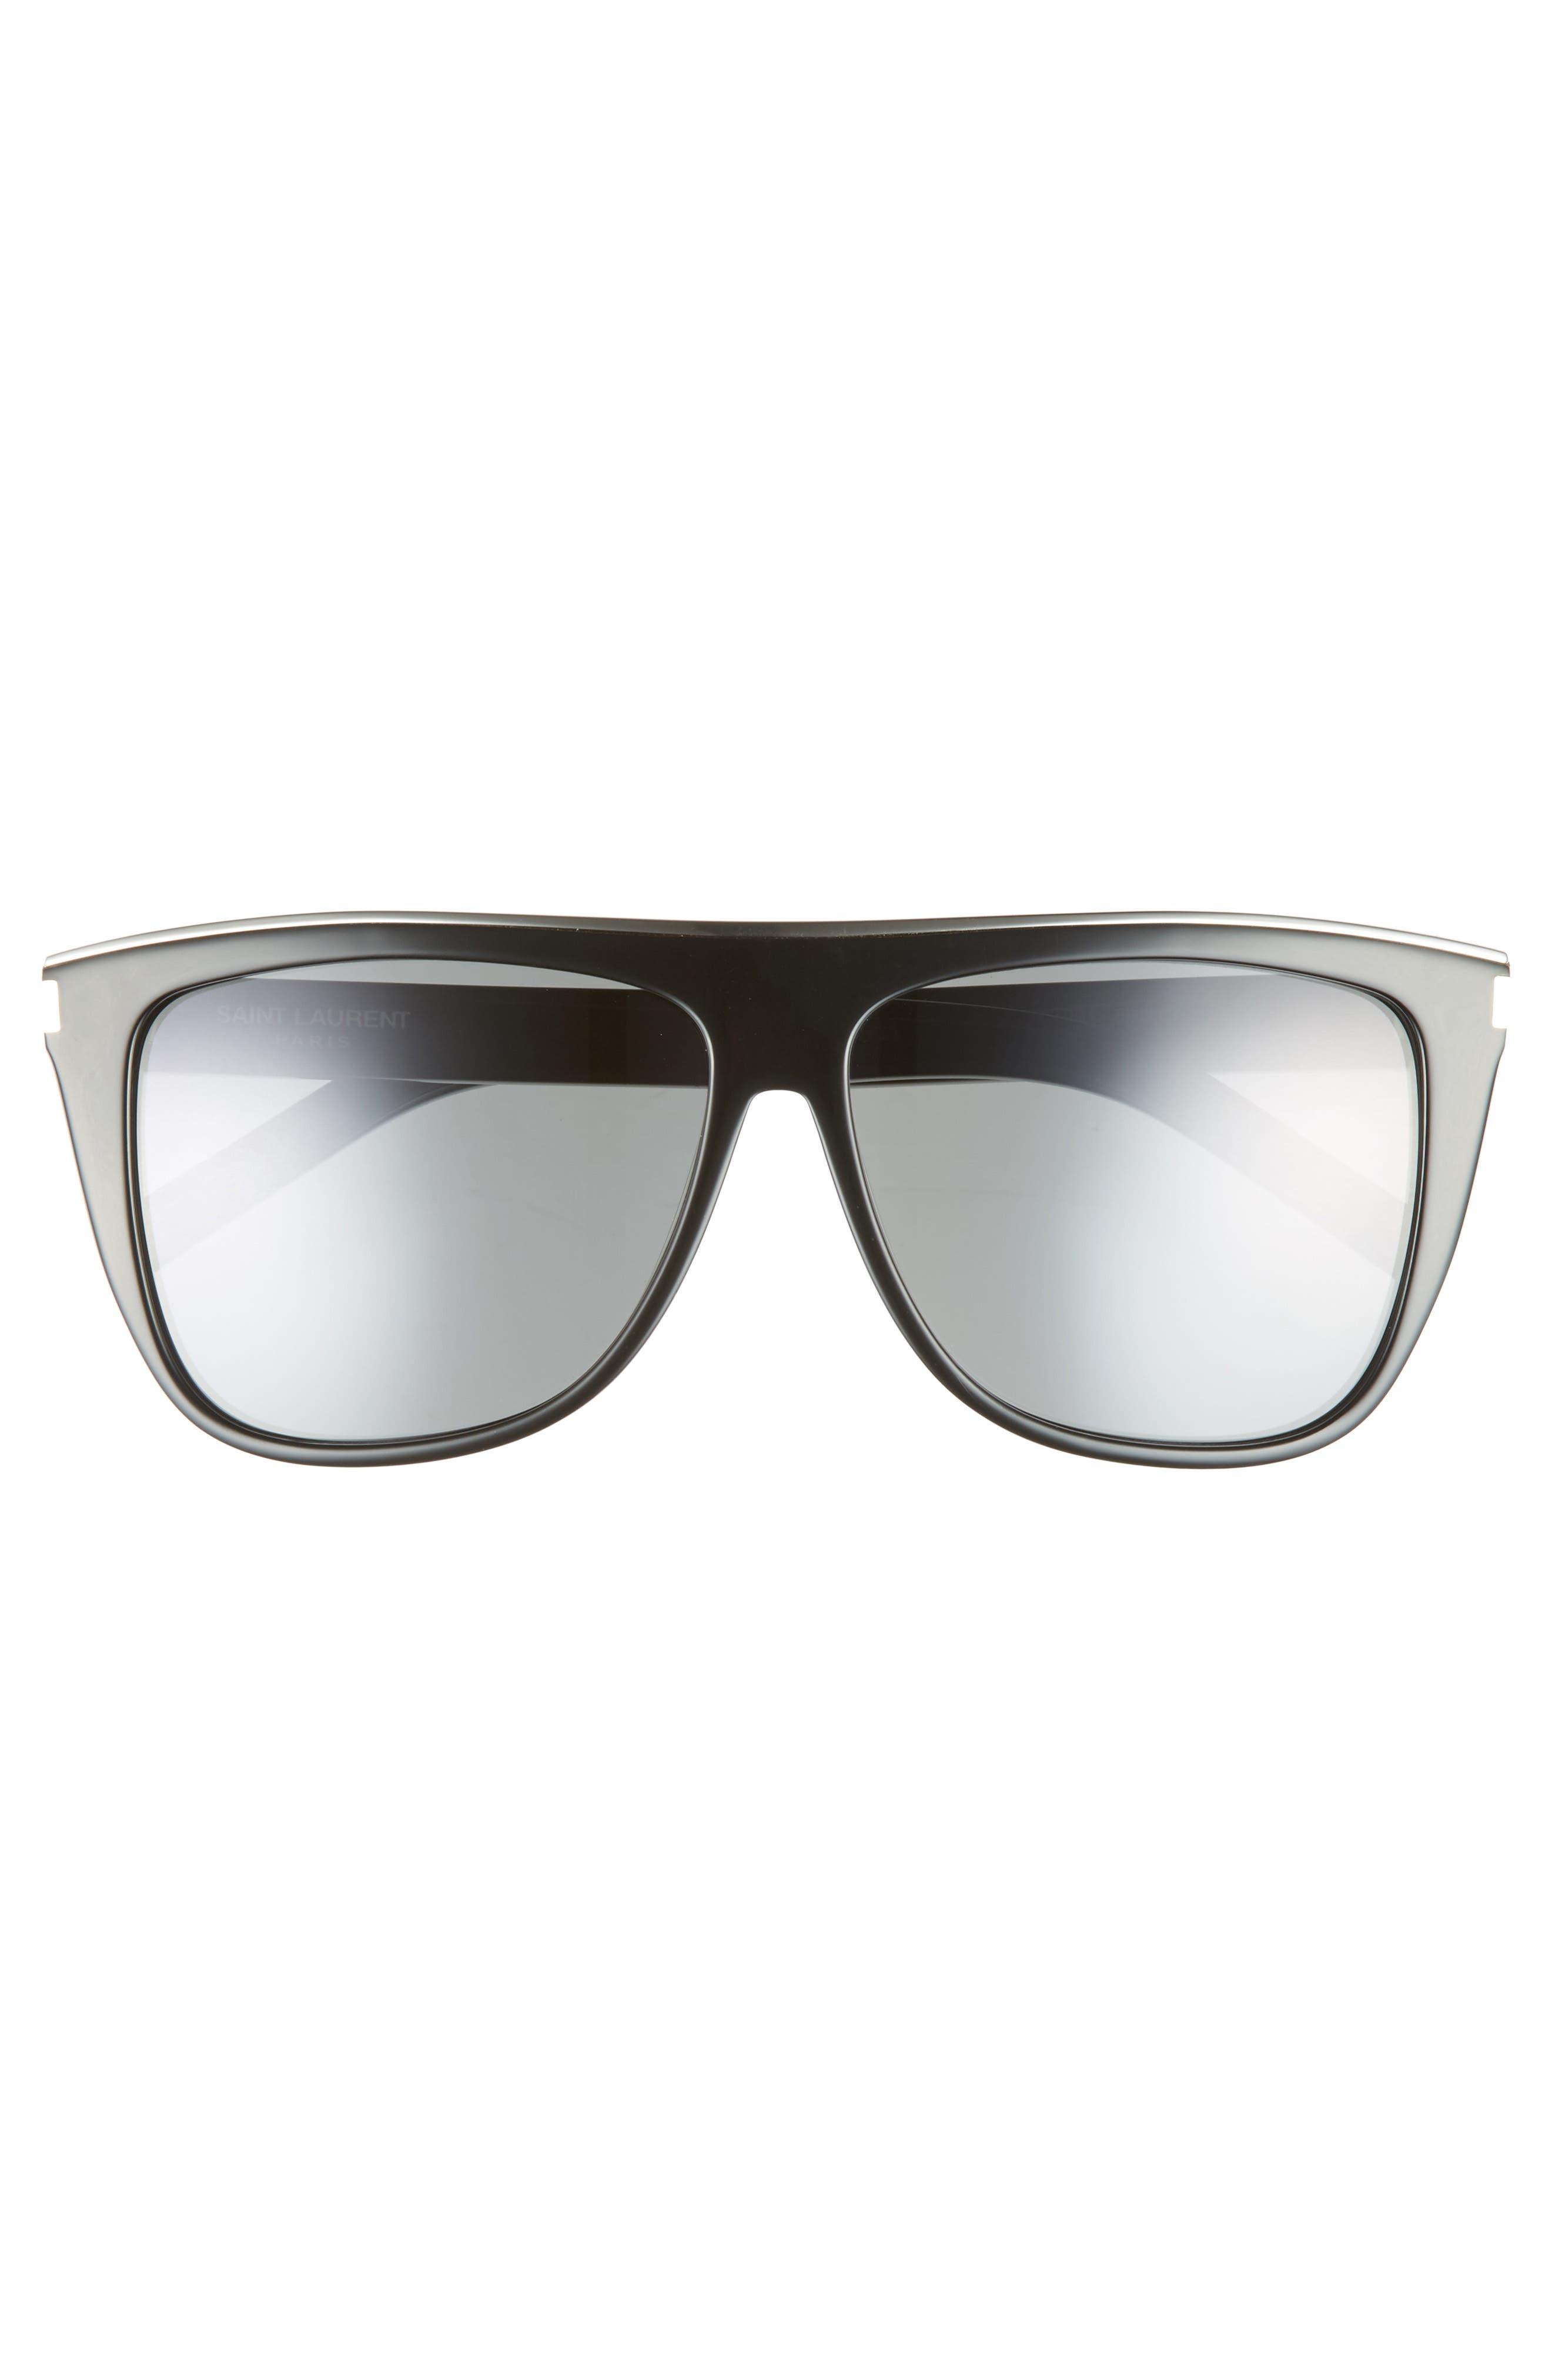 Combi 59mm Flat Top Sunglasses,                             Alternate thumbnail 3, color,                             Black